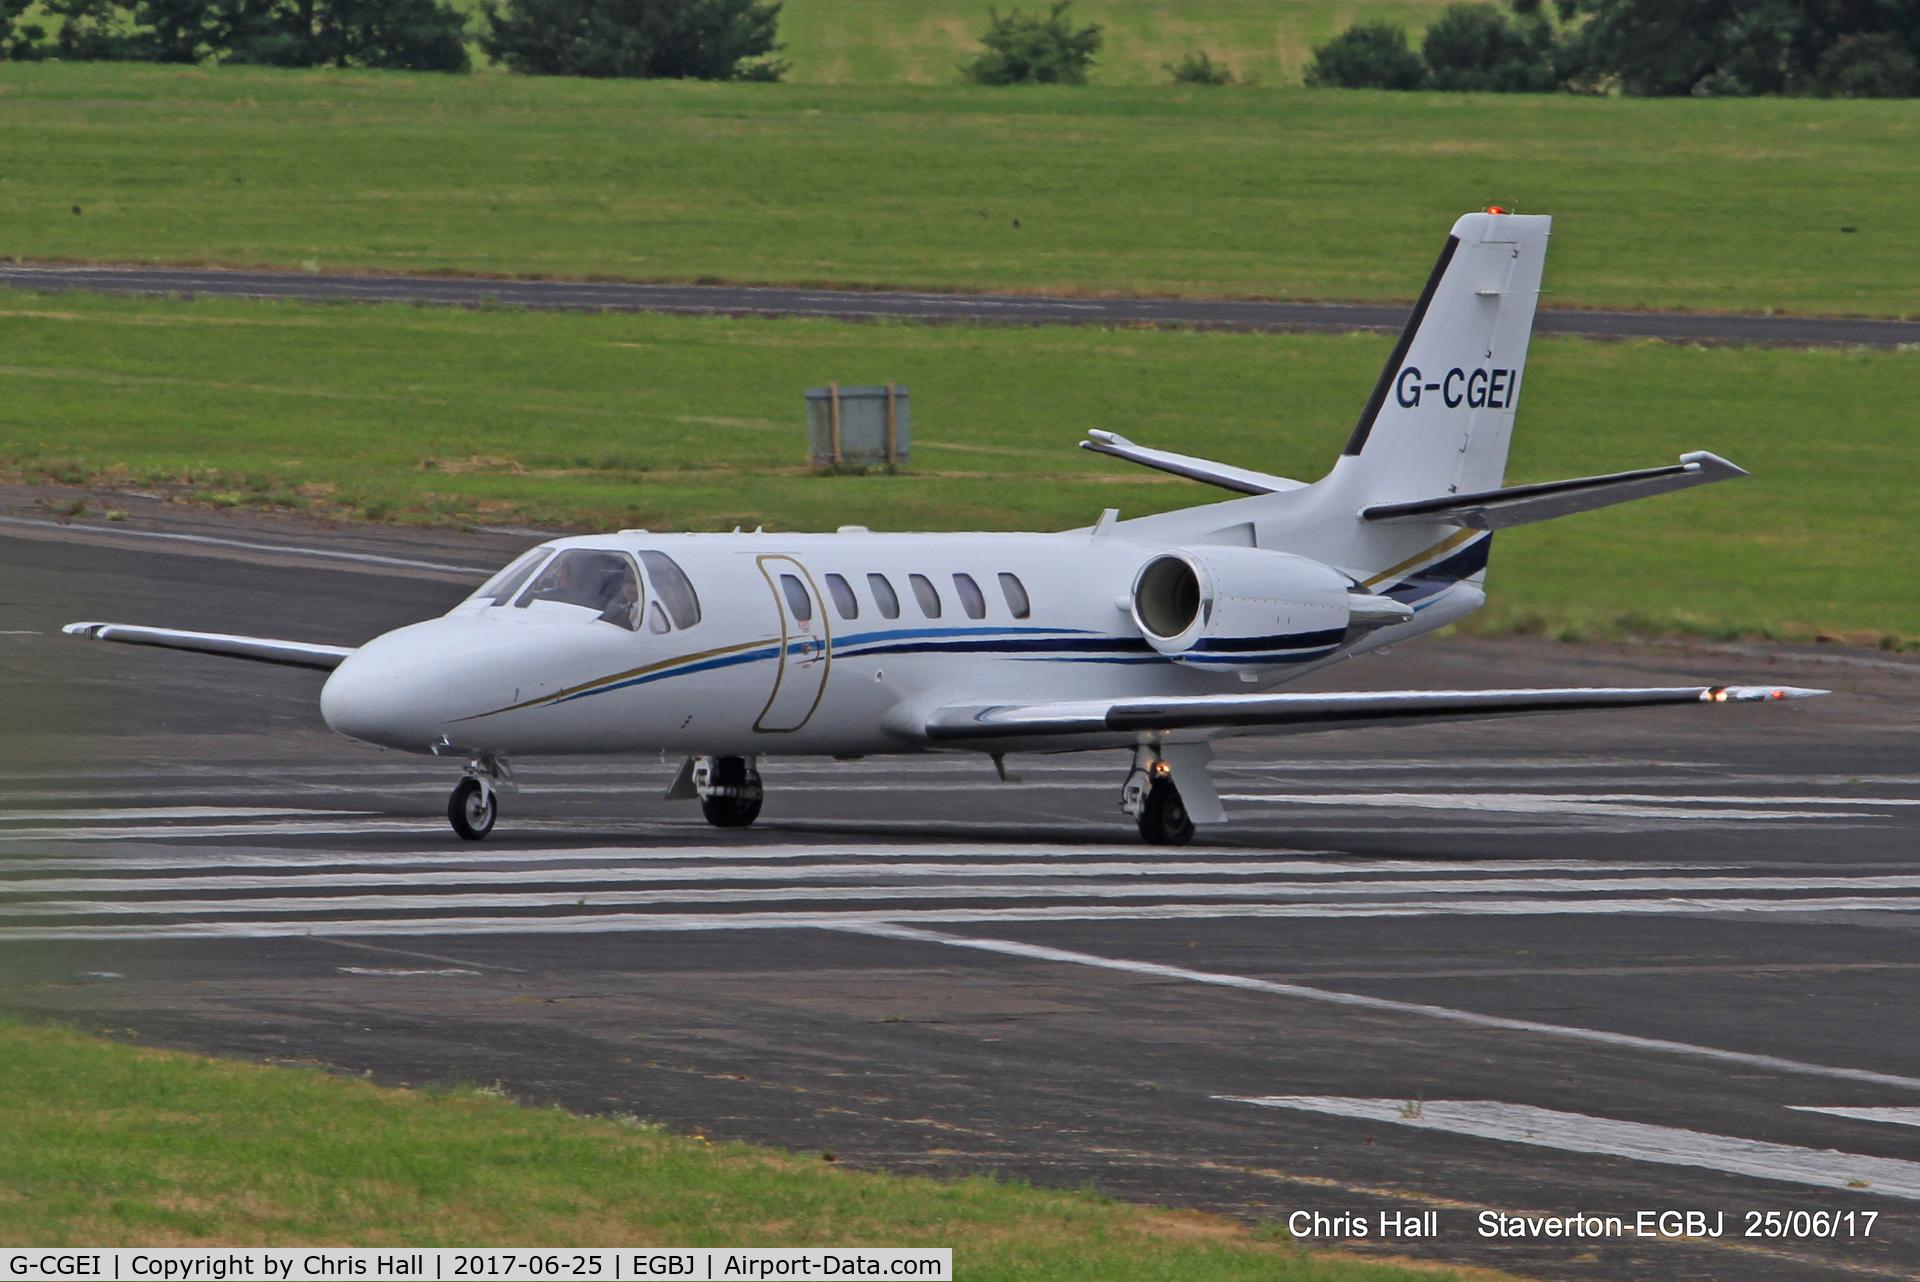 G-CGEI, 2000 Cessna 550 Citation Bravo C/N 550-0951, at Staverton